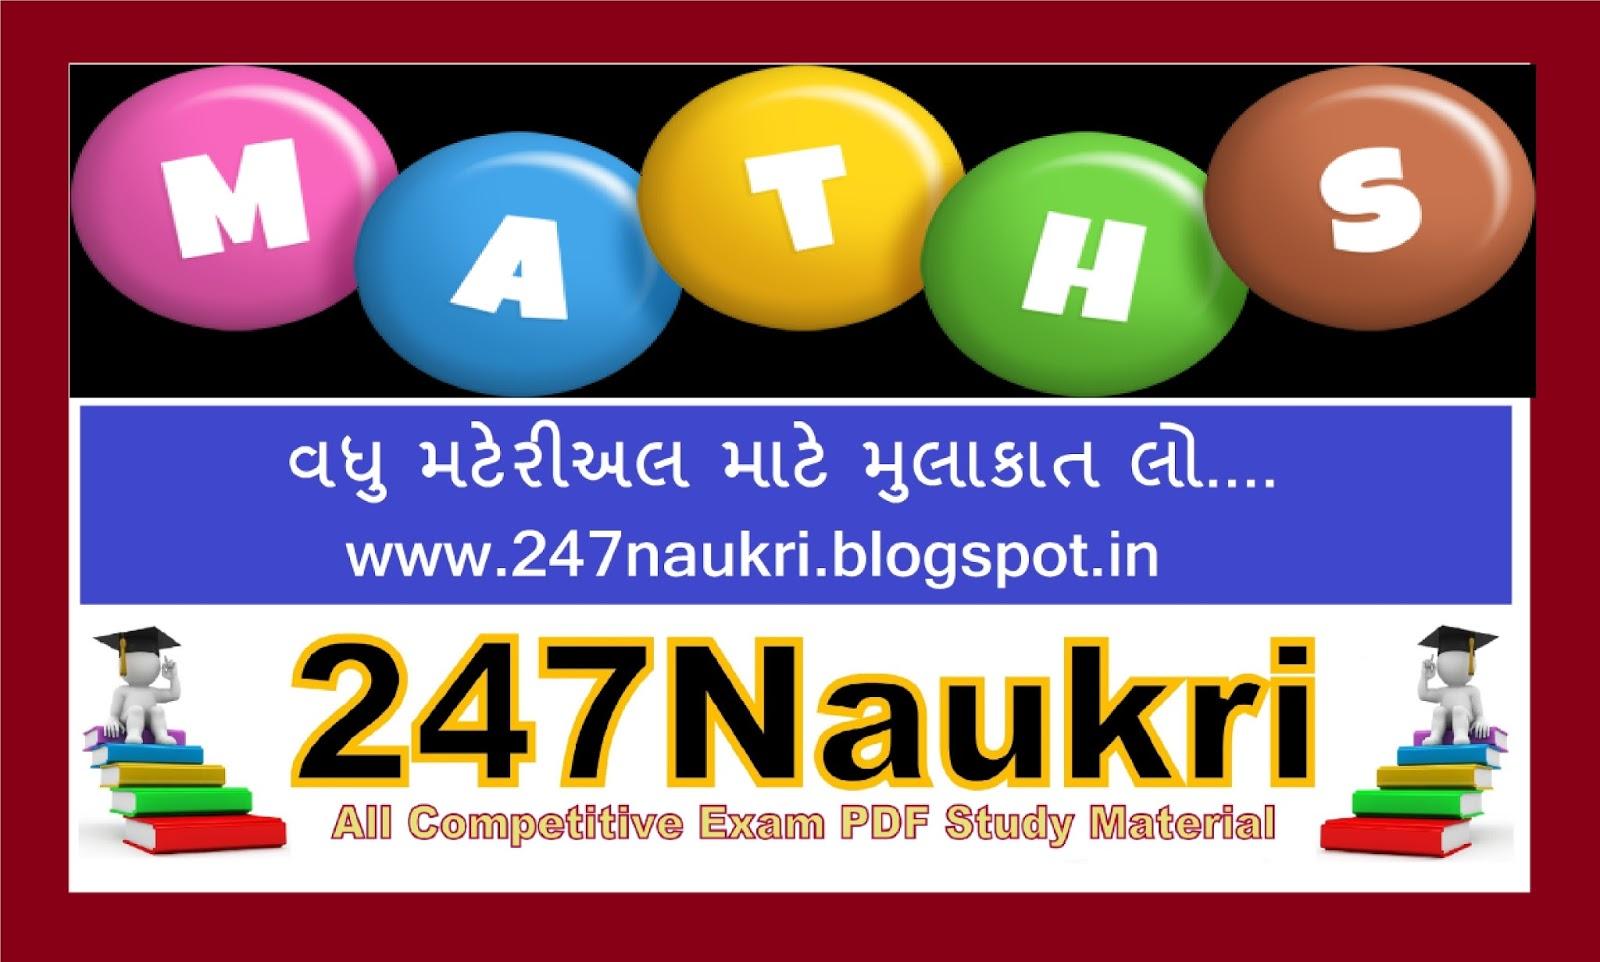 World Inbox Book PDF Free Download - Naukri